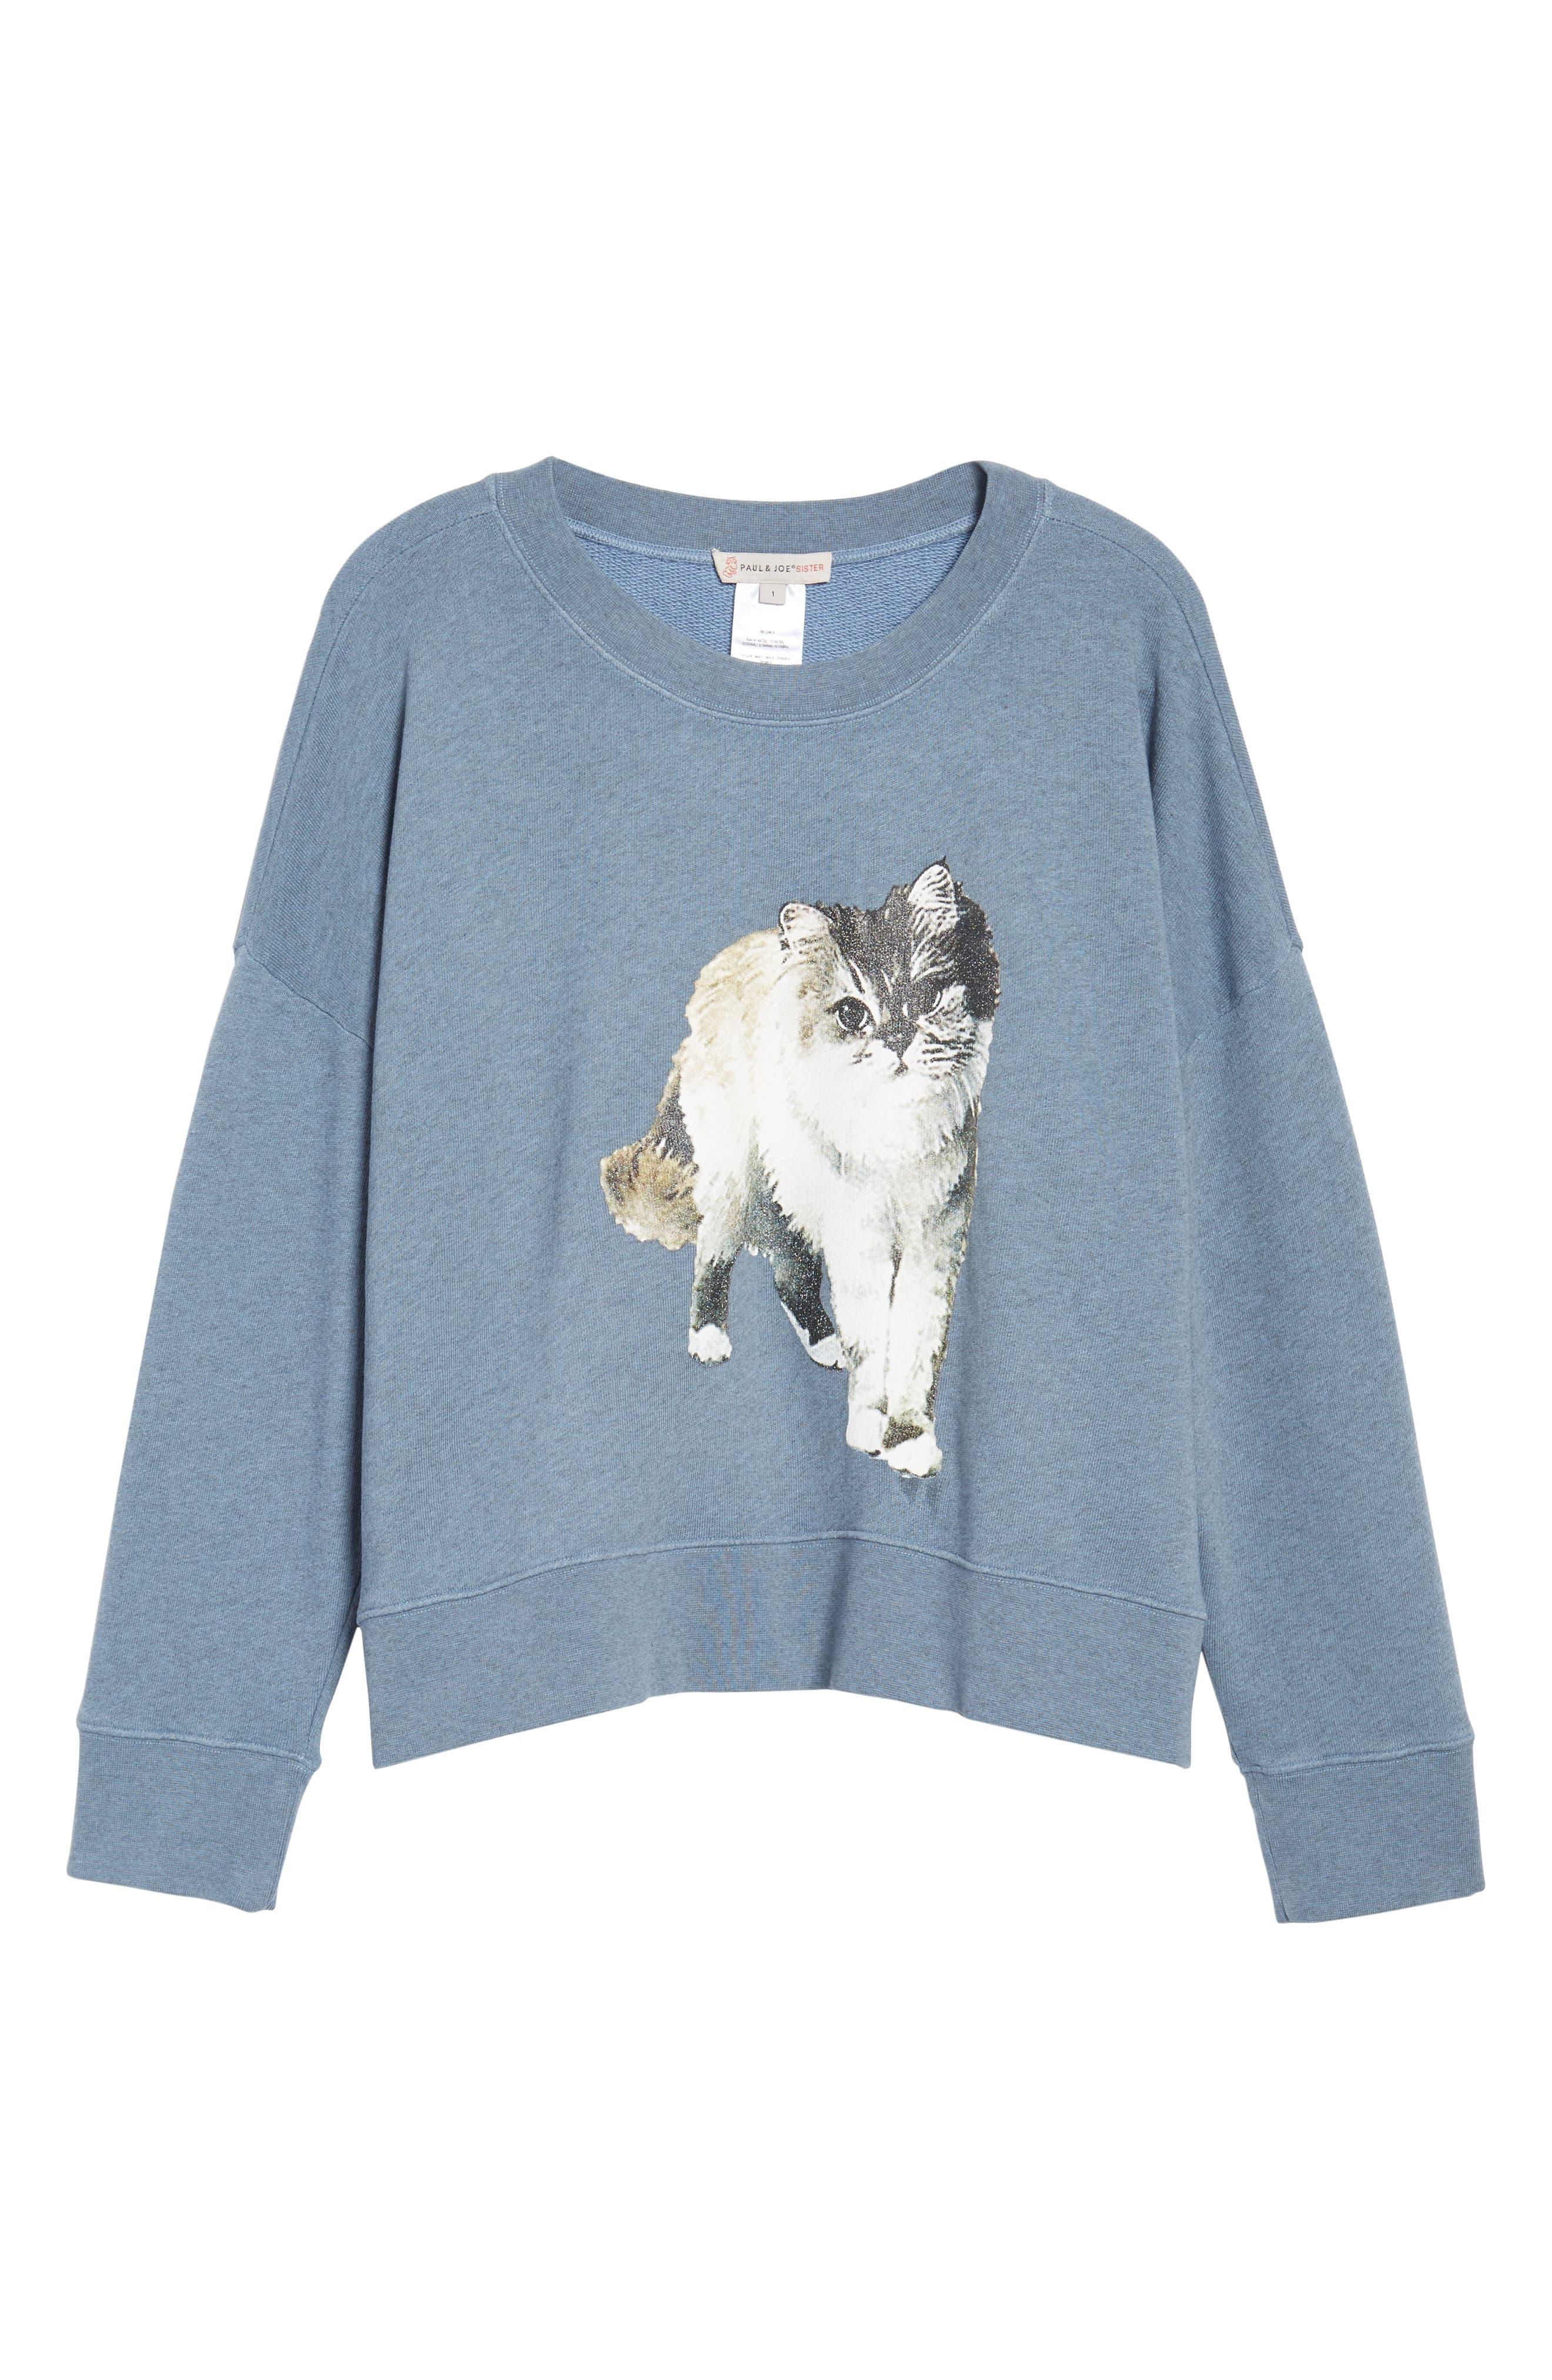 Kyoto Sweatshirt,                             Alternate thumbnail 6, color,                             400